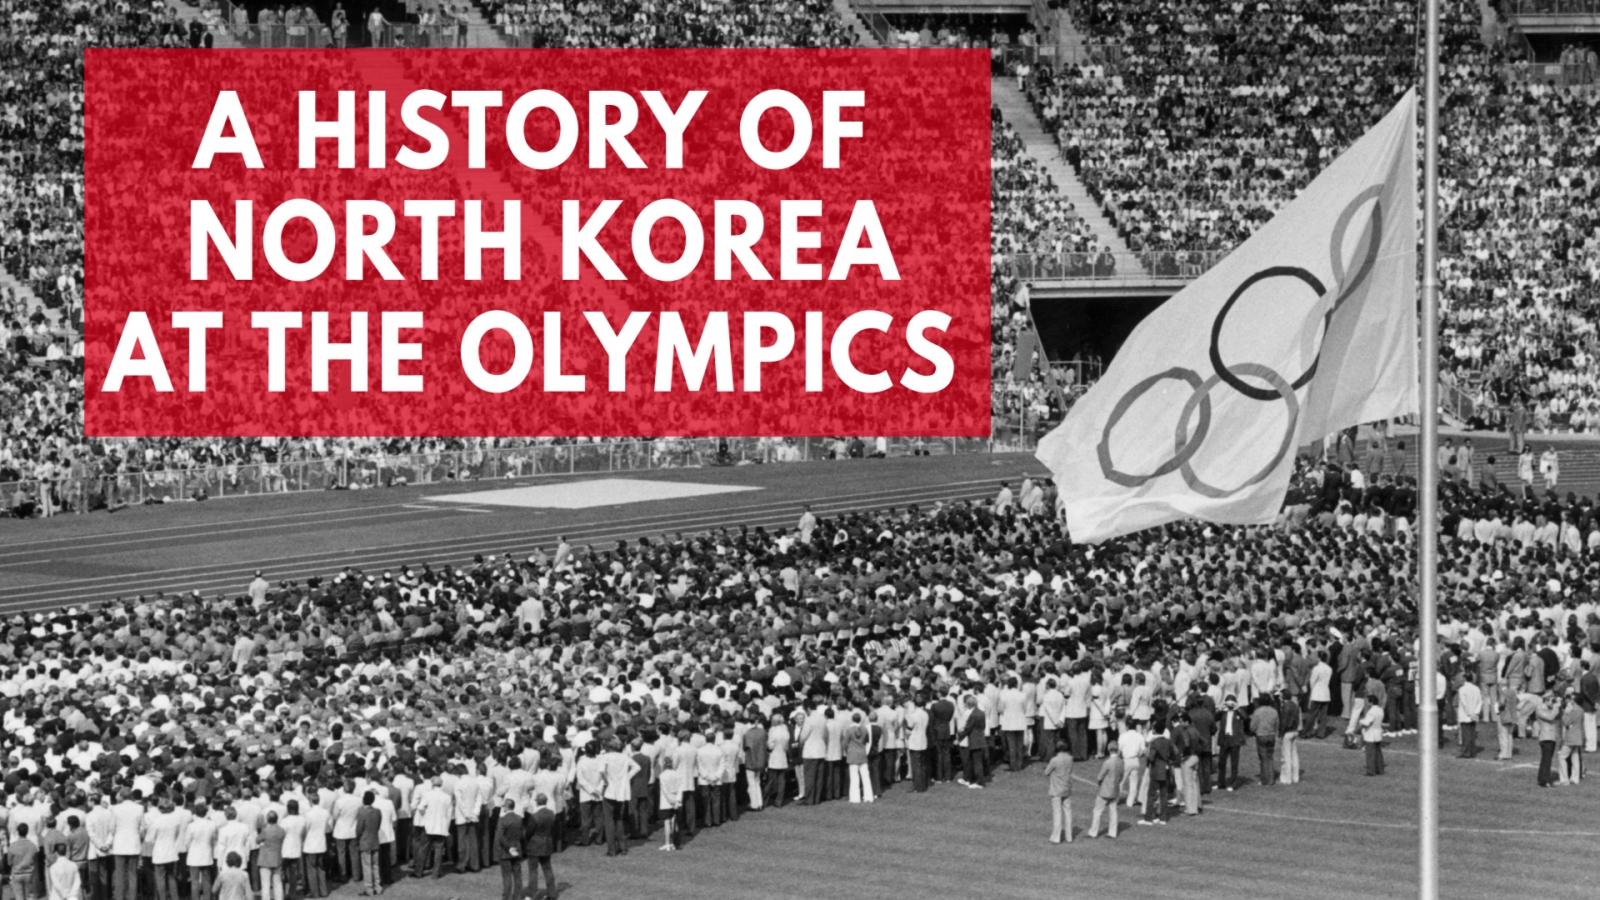 A History Of North Korea At The Olympics